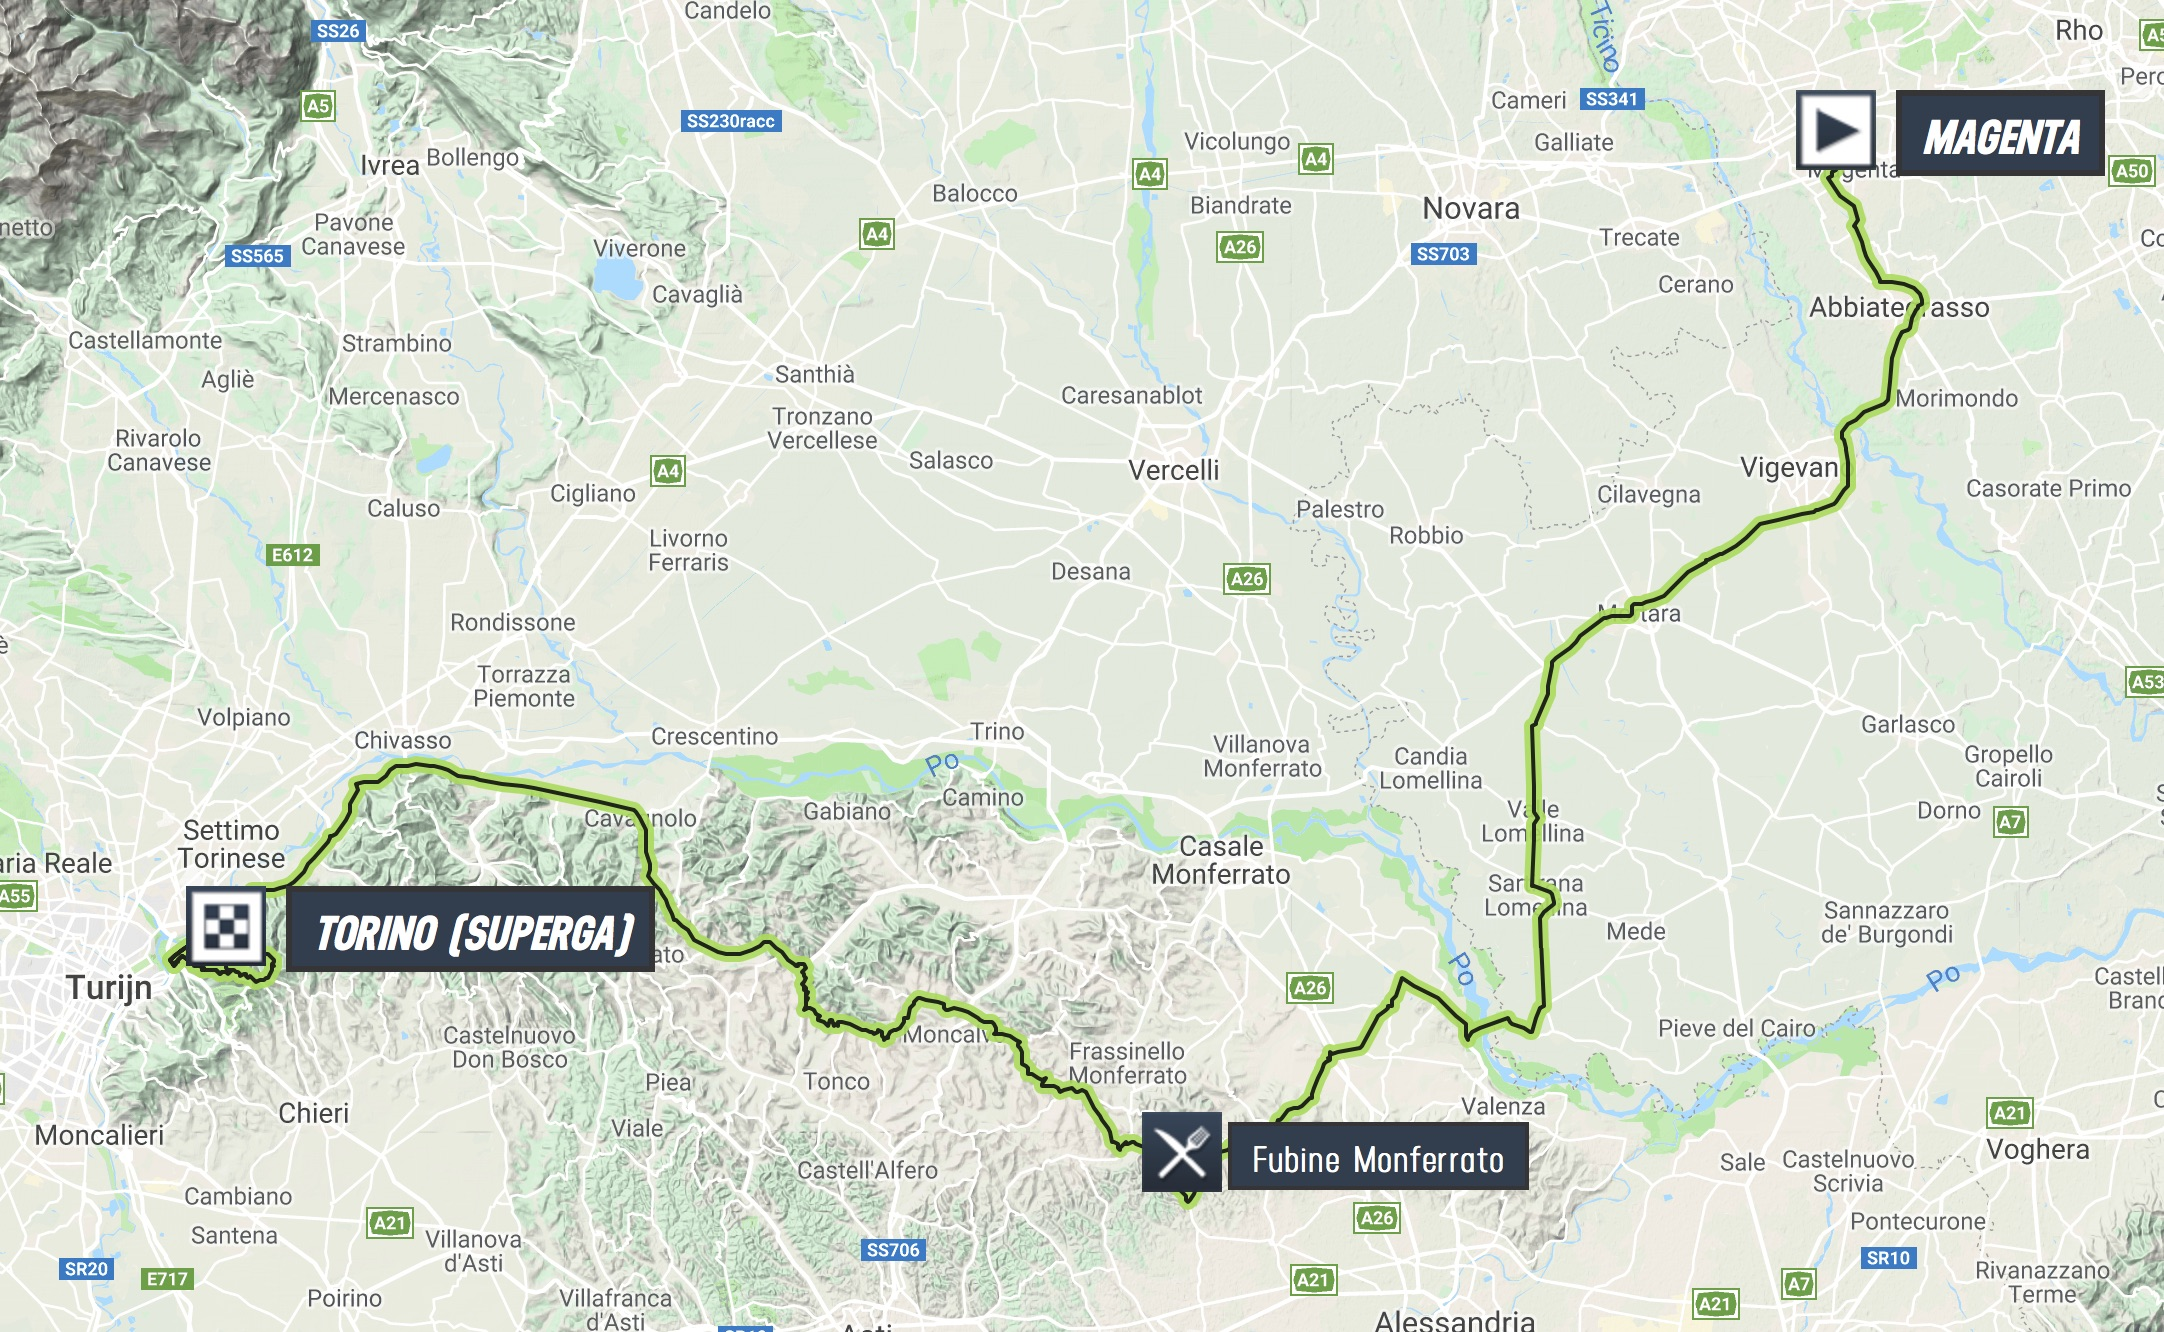 Race Thread 2018 Milano Torino 1hc Peloton Torio My First Plane Complete Set October 10th Magenta Mi